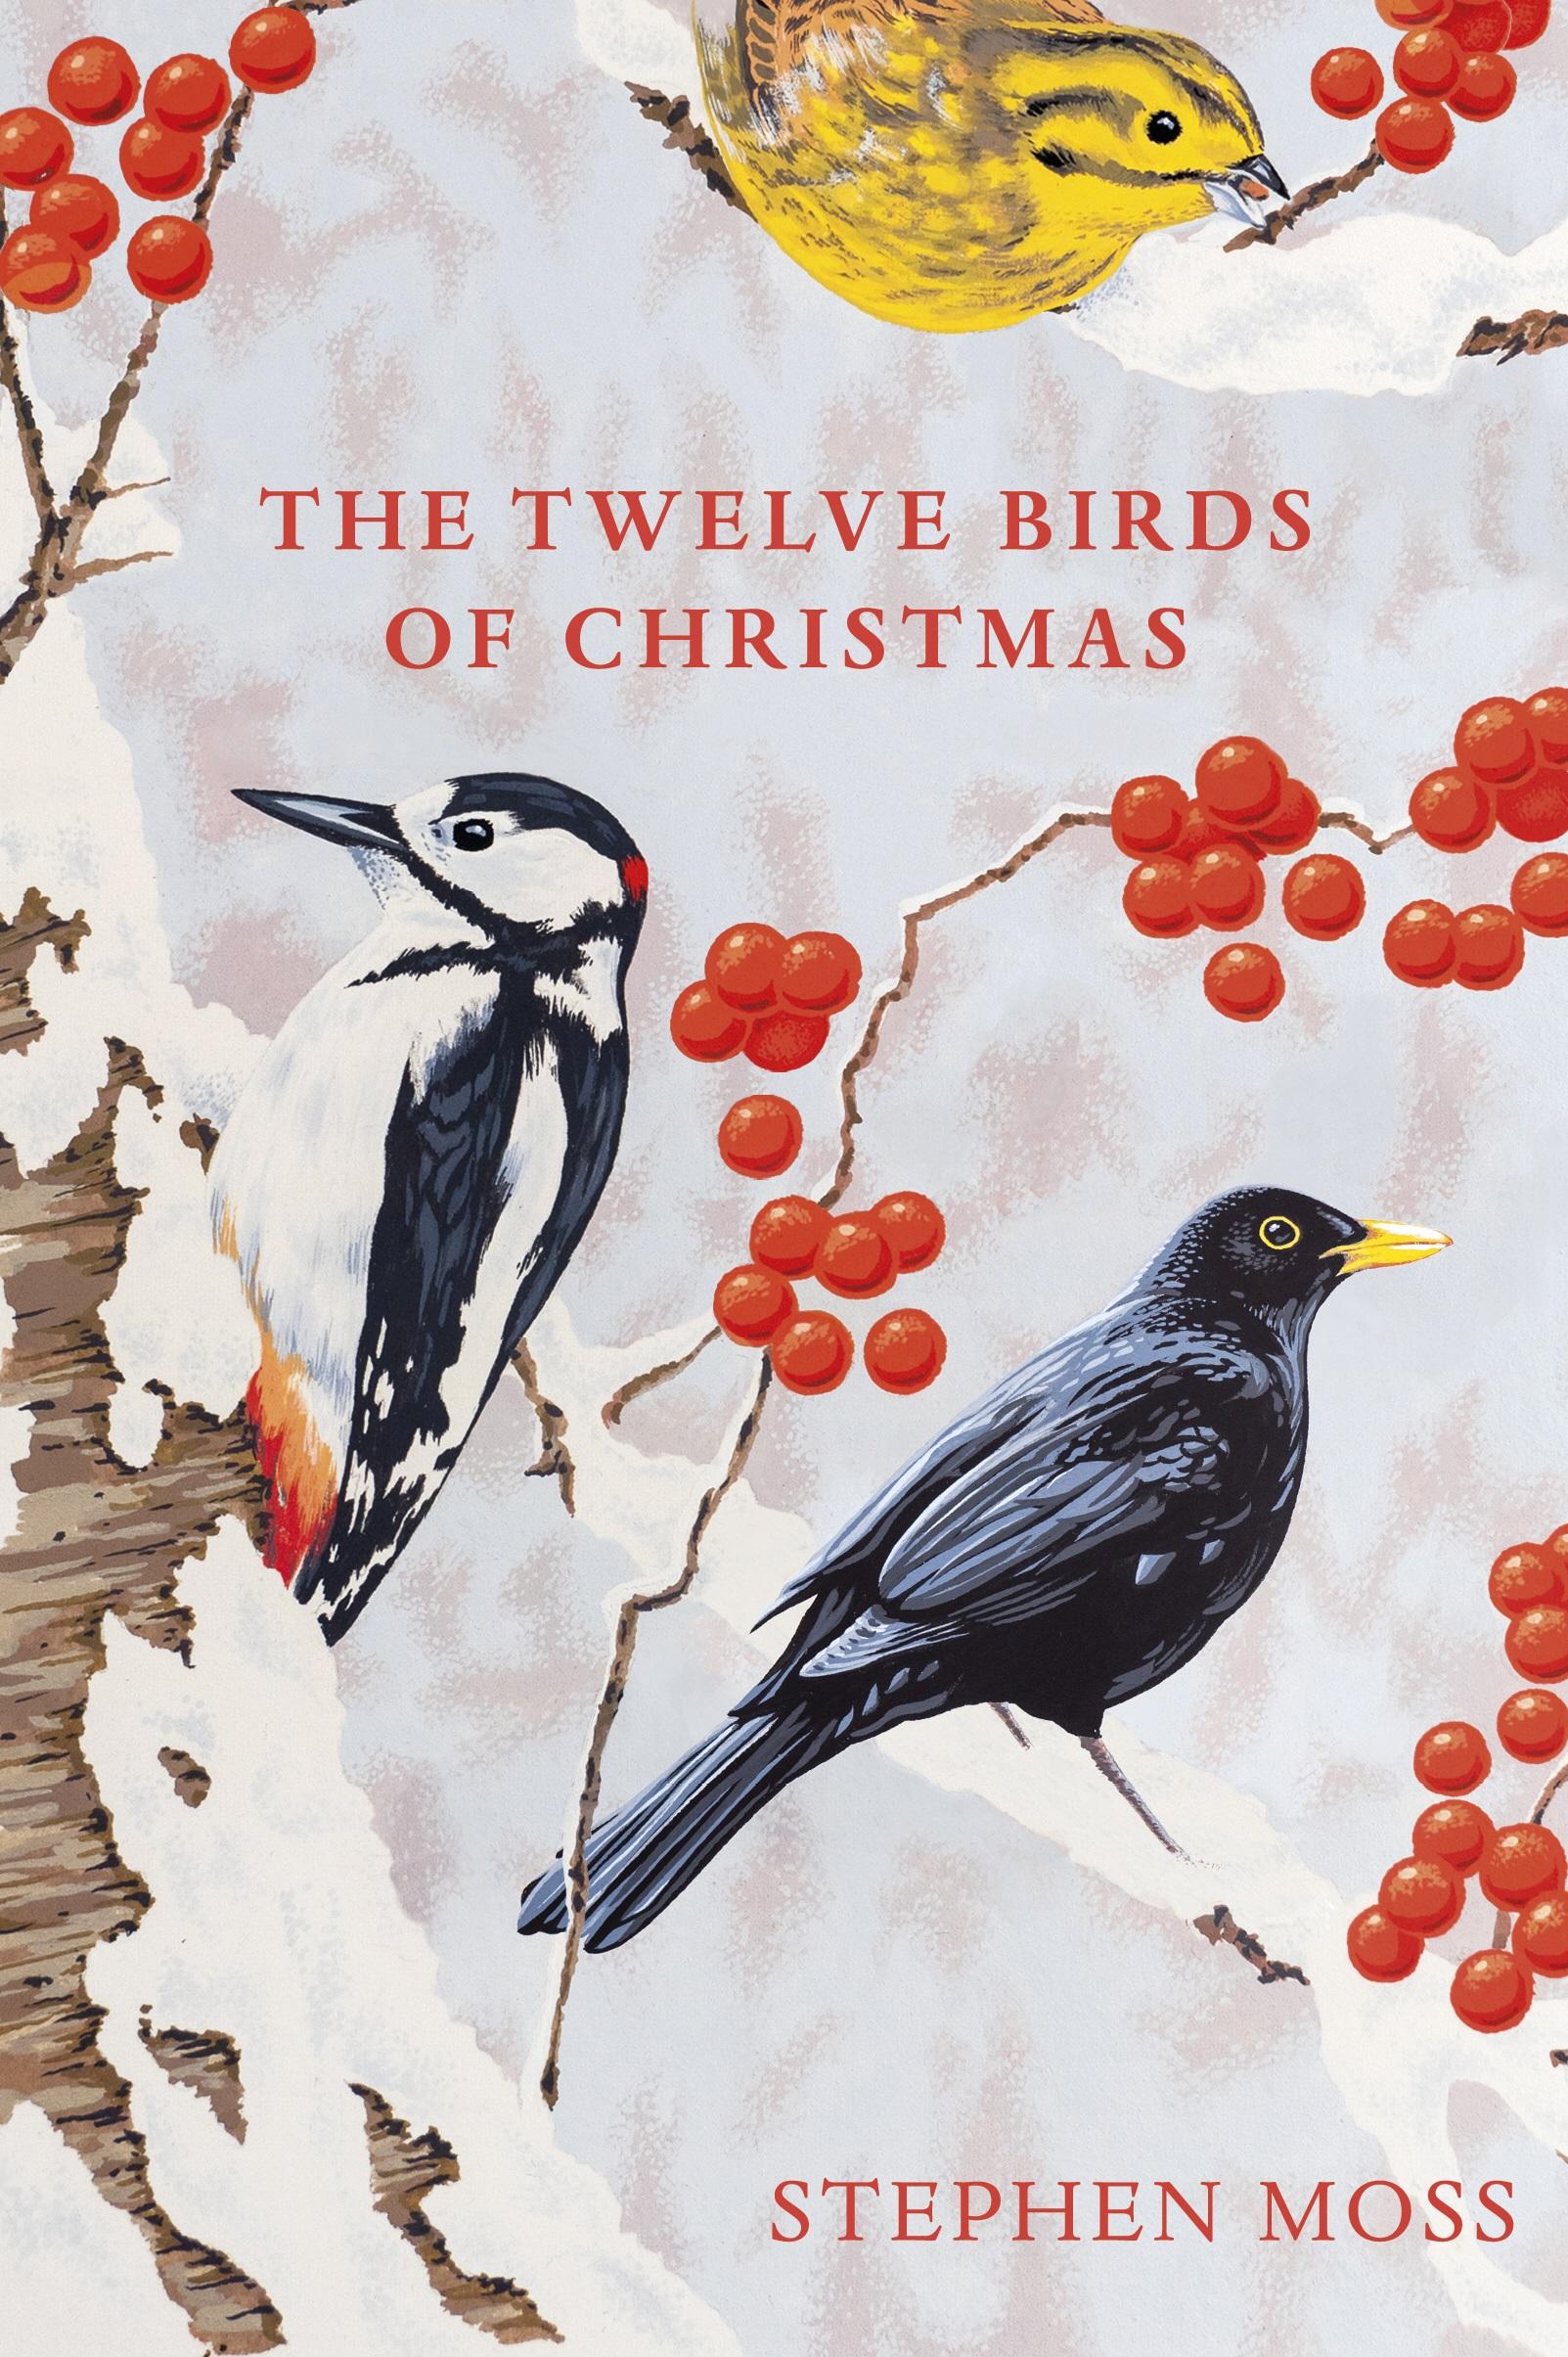 The Twelve Birds of Christmas - BirdGuides